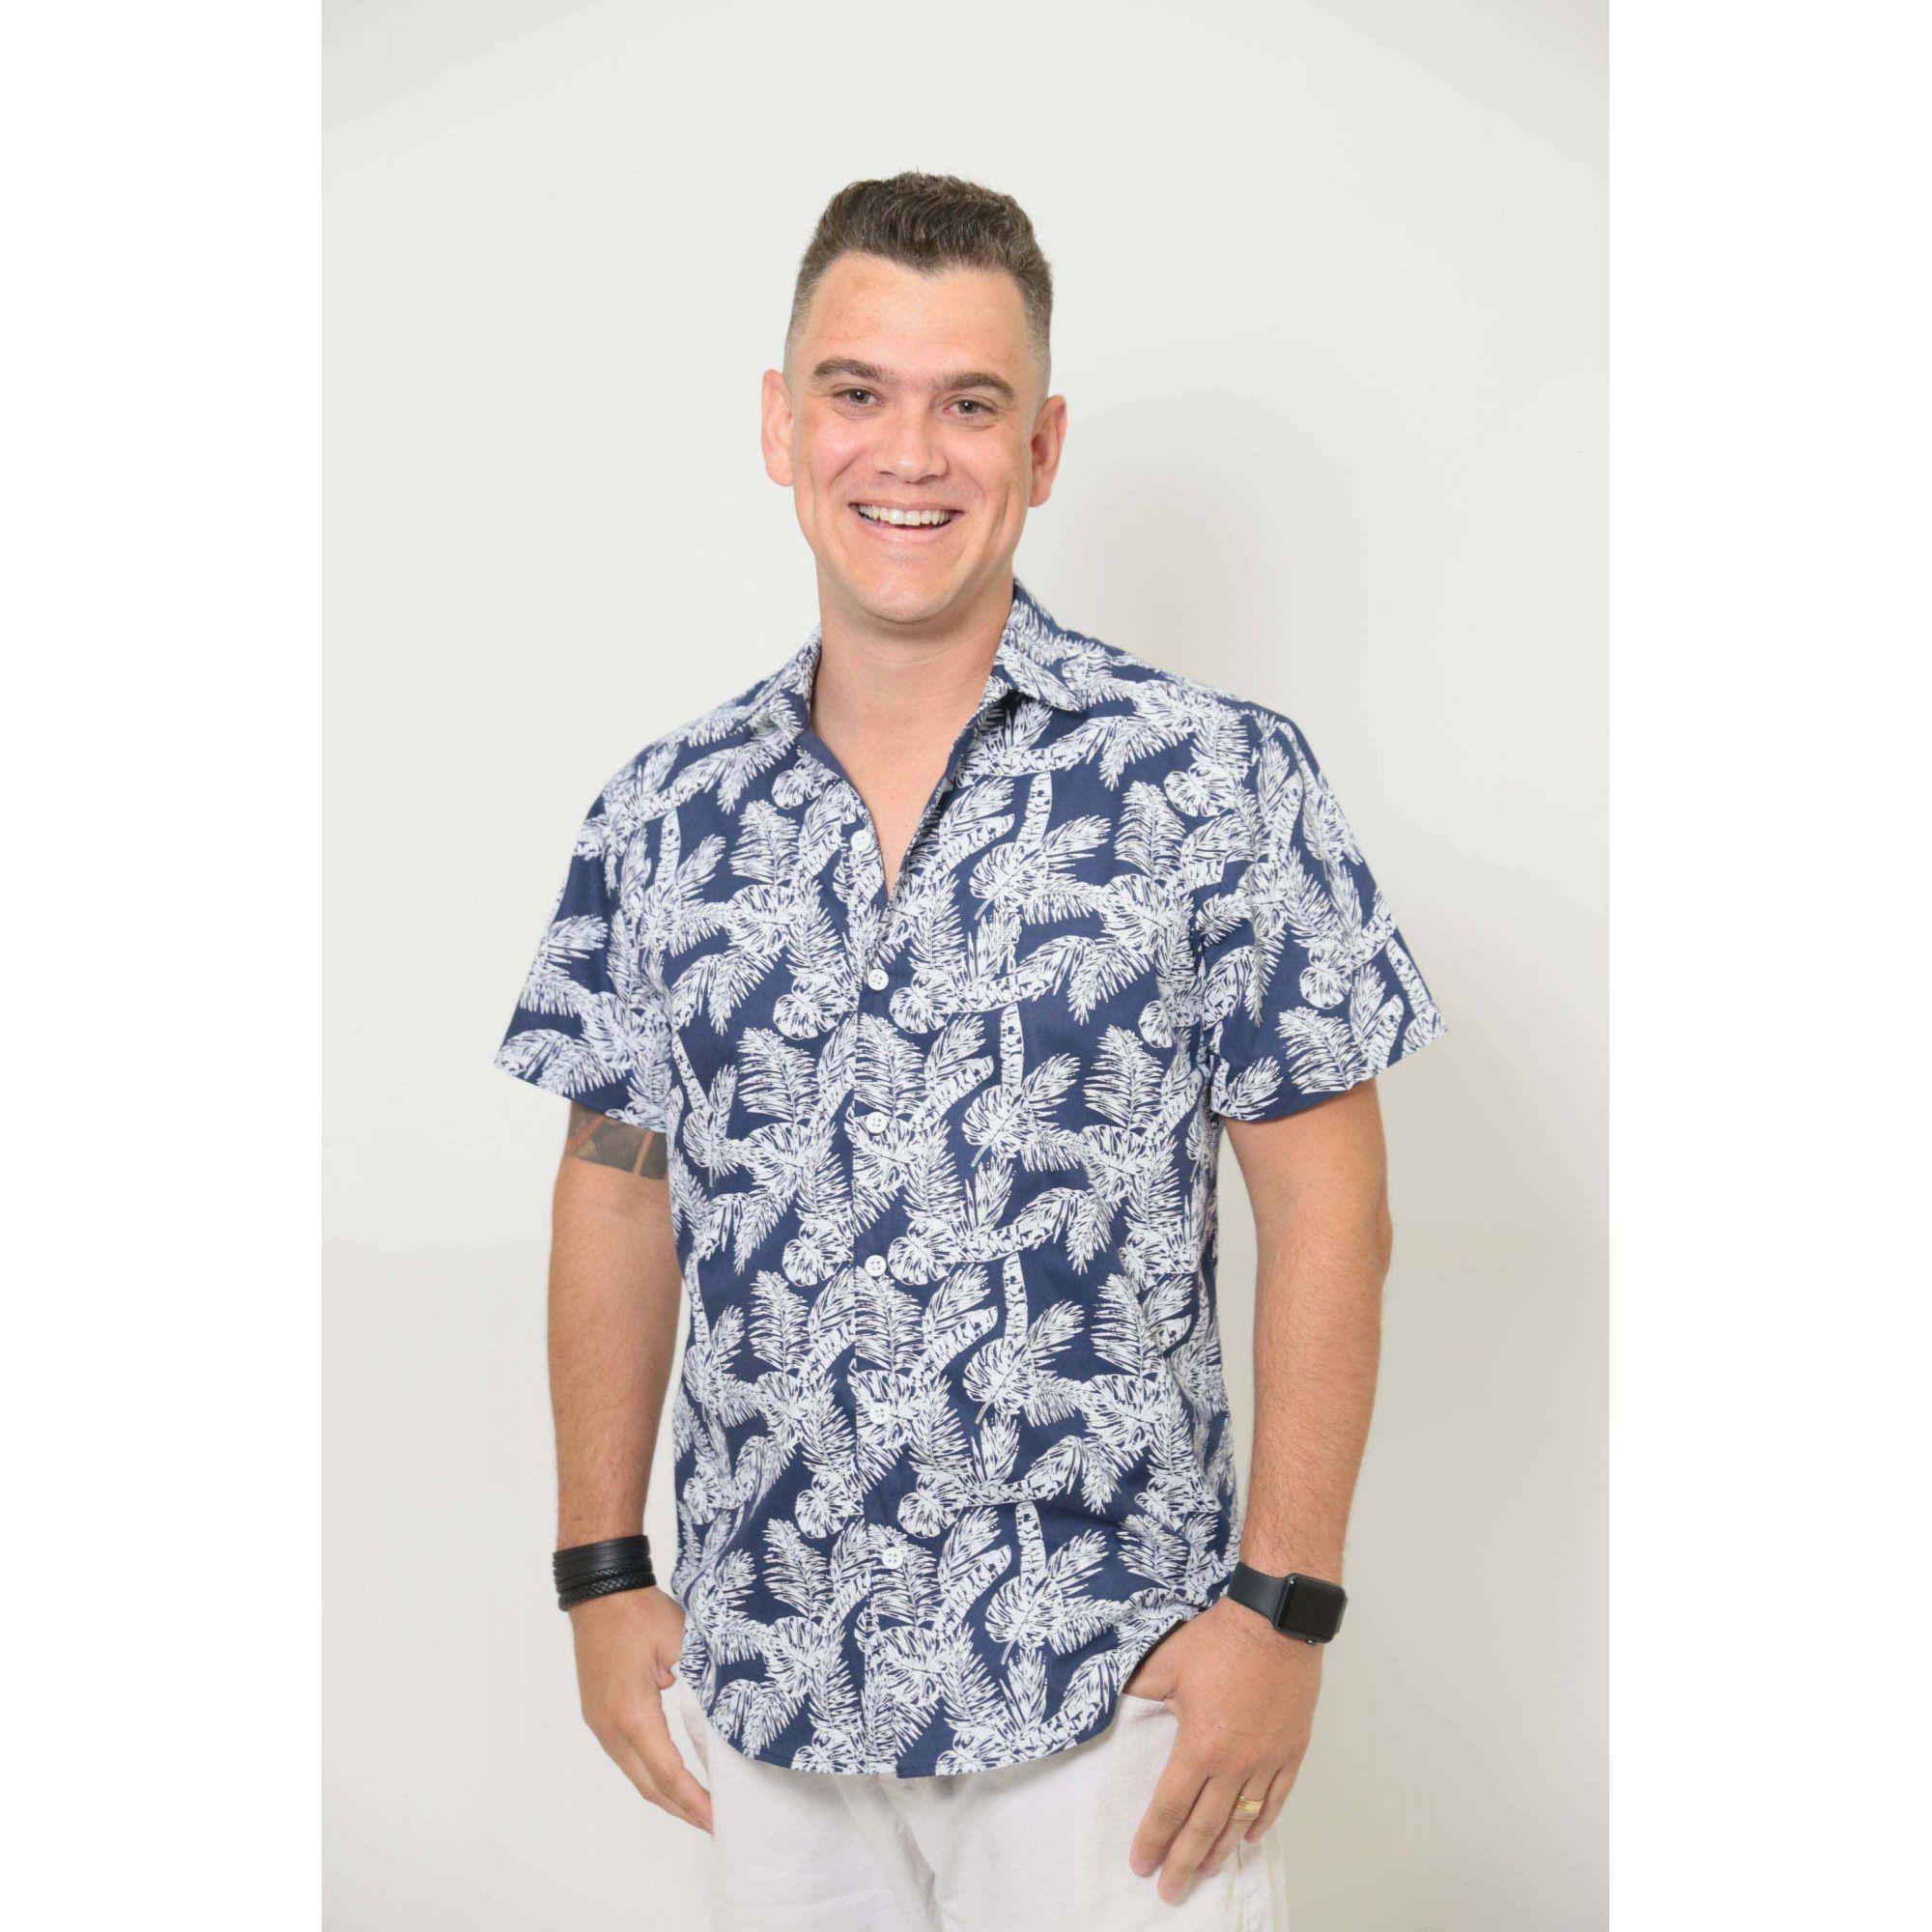 PAI E FILHA > Kit 02 Camisas Manga Curta Azul Floresta [Coleção Tal Pai Tal Filha]  - Heitor Fashion Brazil